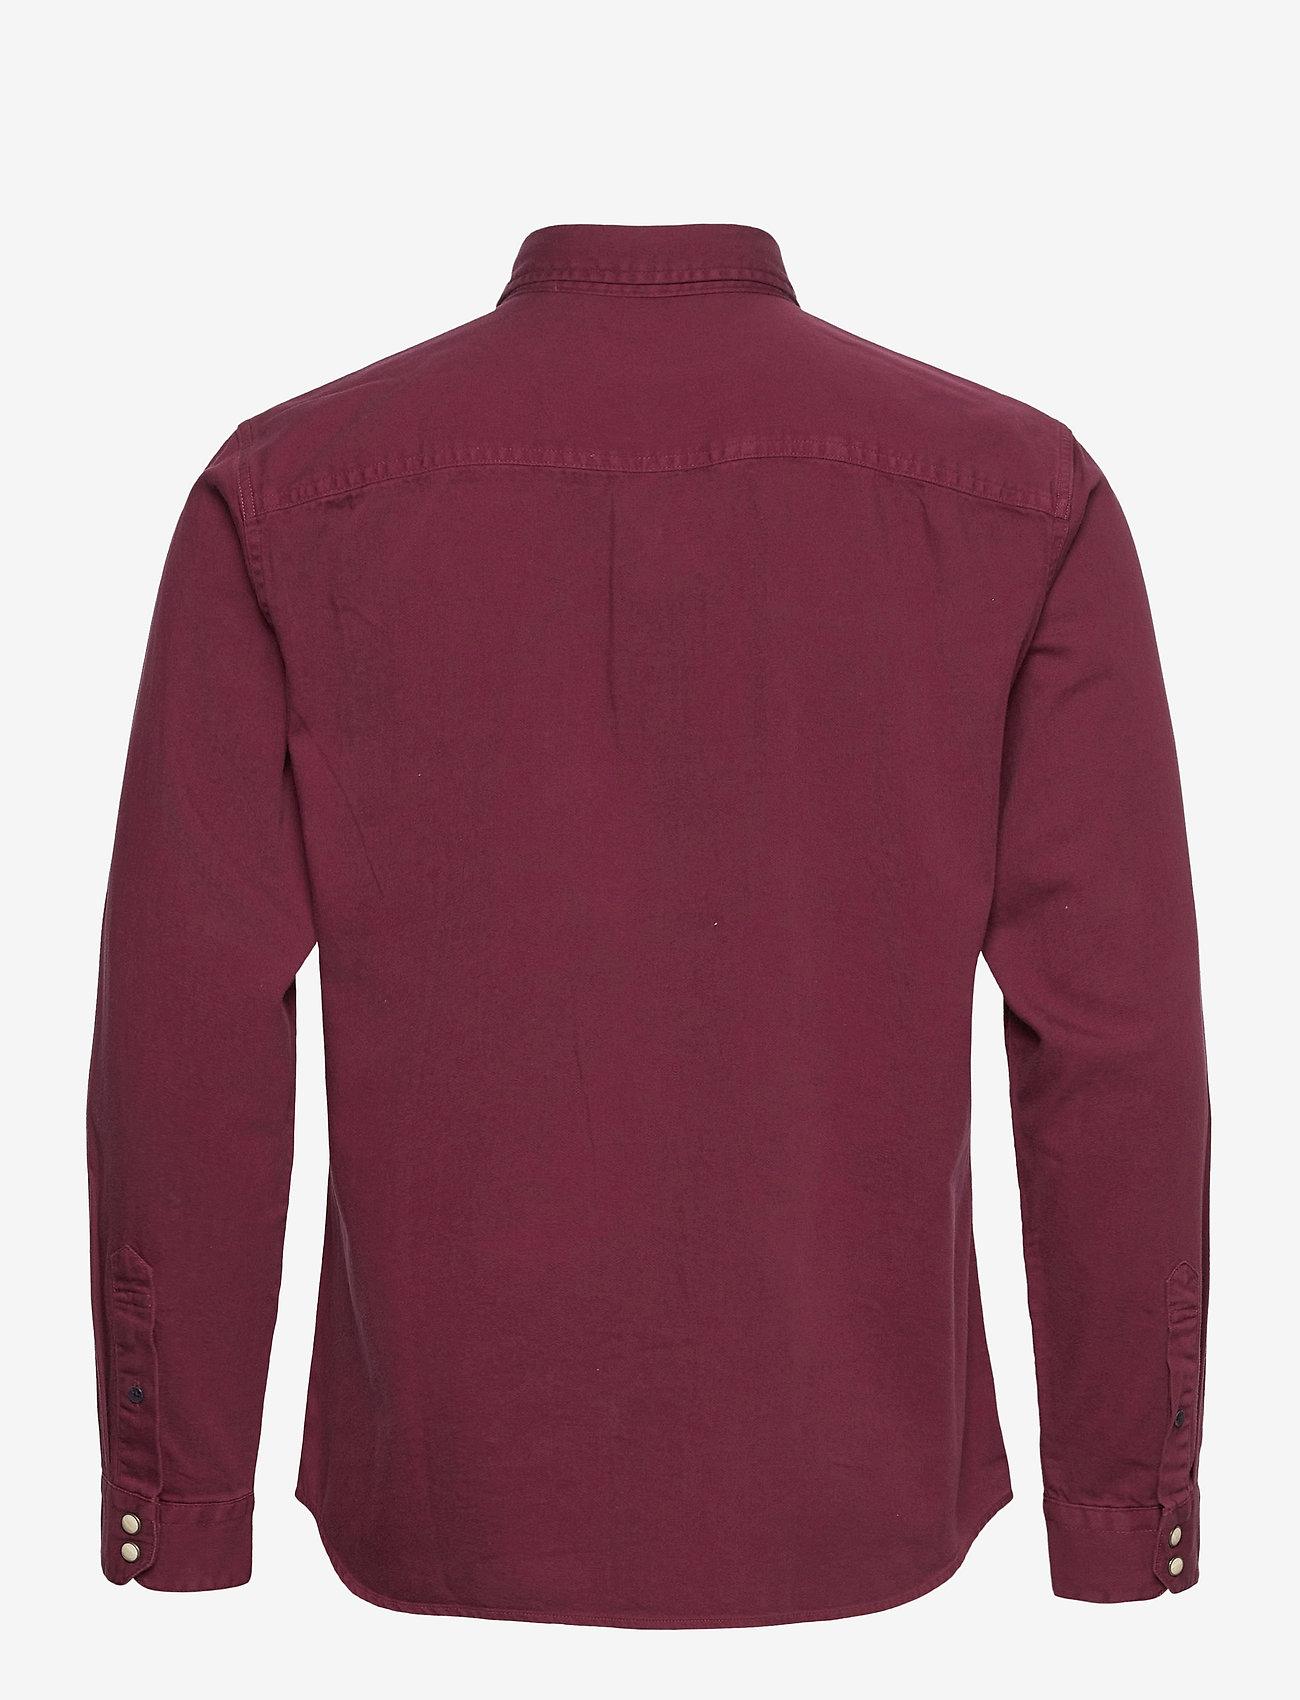 Jack & Jones - JORLUCKY SHIRT LS - basic skjortor - fig - 1